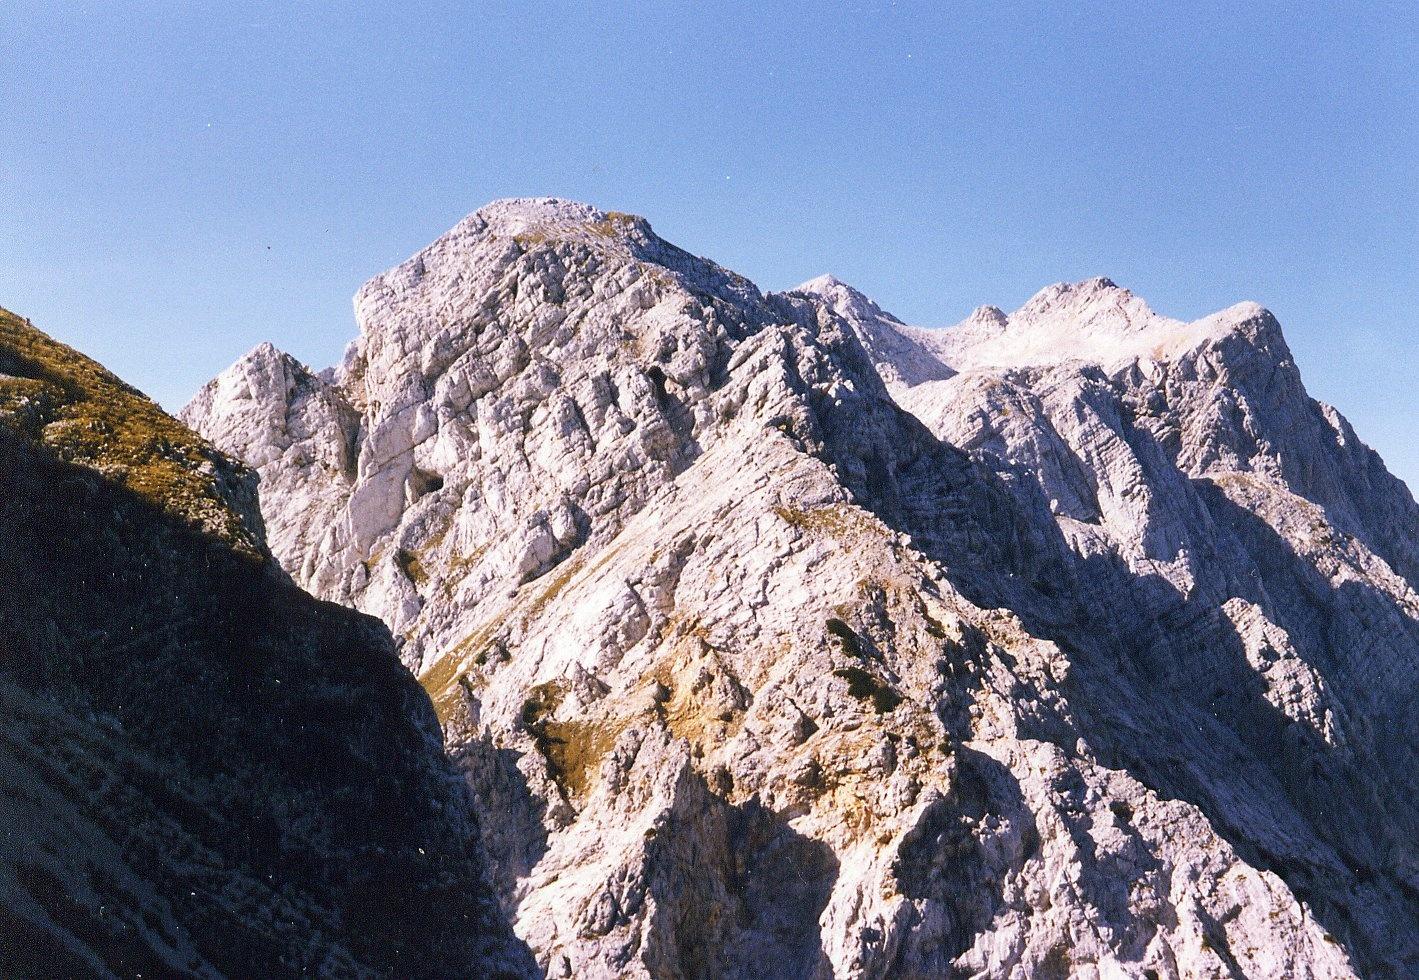 TURSKA GORA 2251m, Kamniške alpe 1990.10.05 by zvnktomasevic